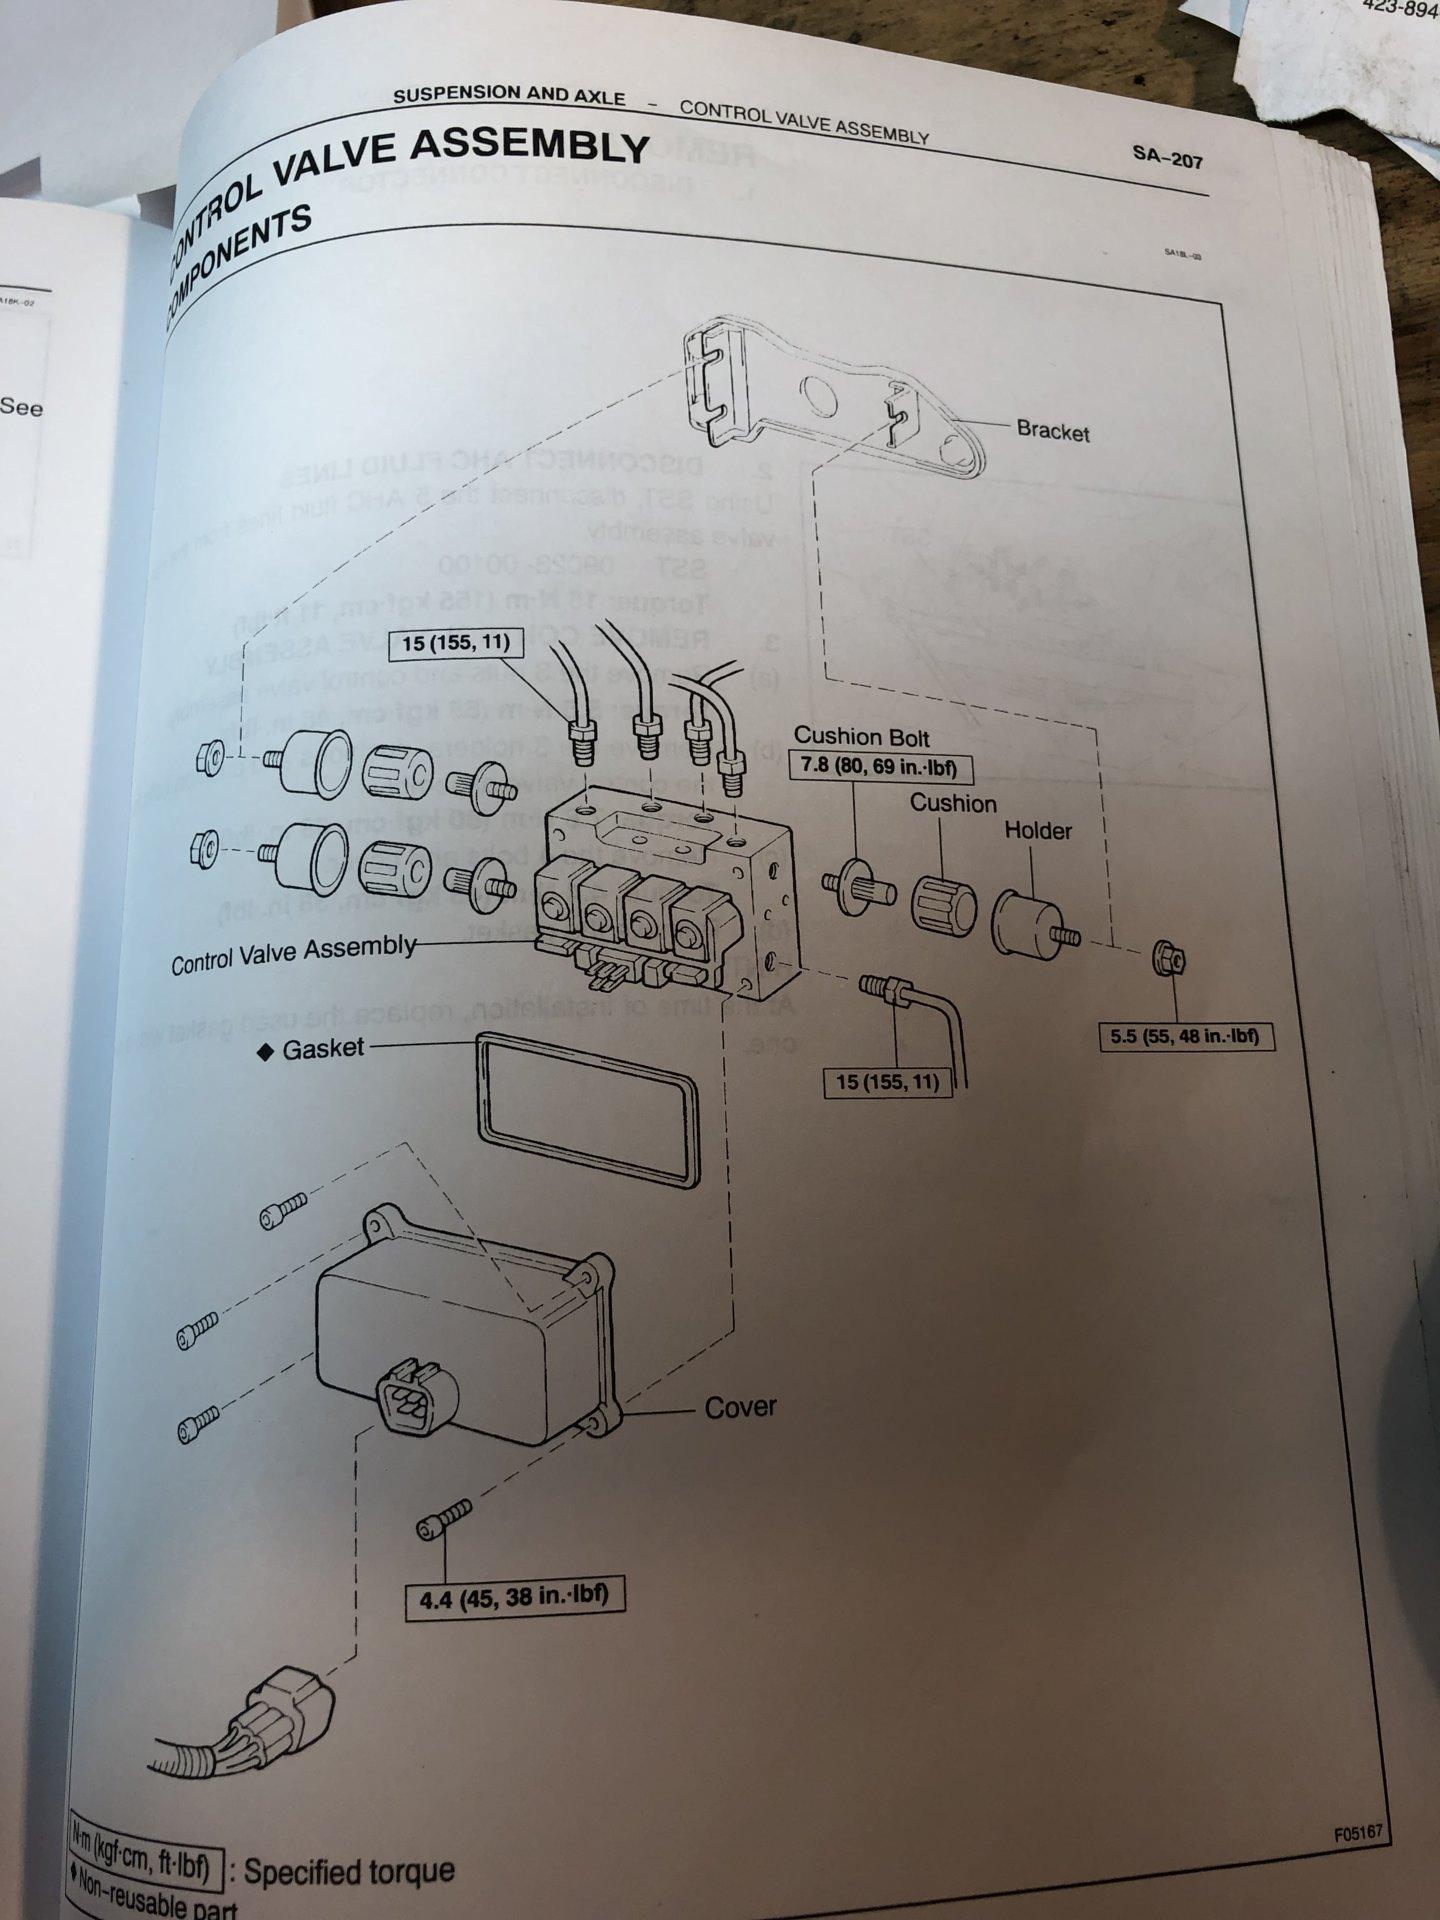 C1BB6FA8-BD7A-462B-80B8-768A7D3ACEB5.jpeg